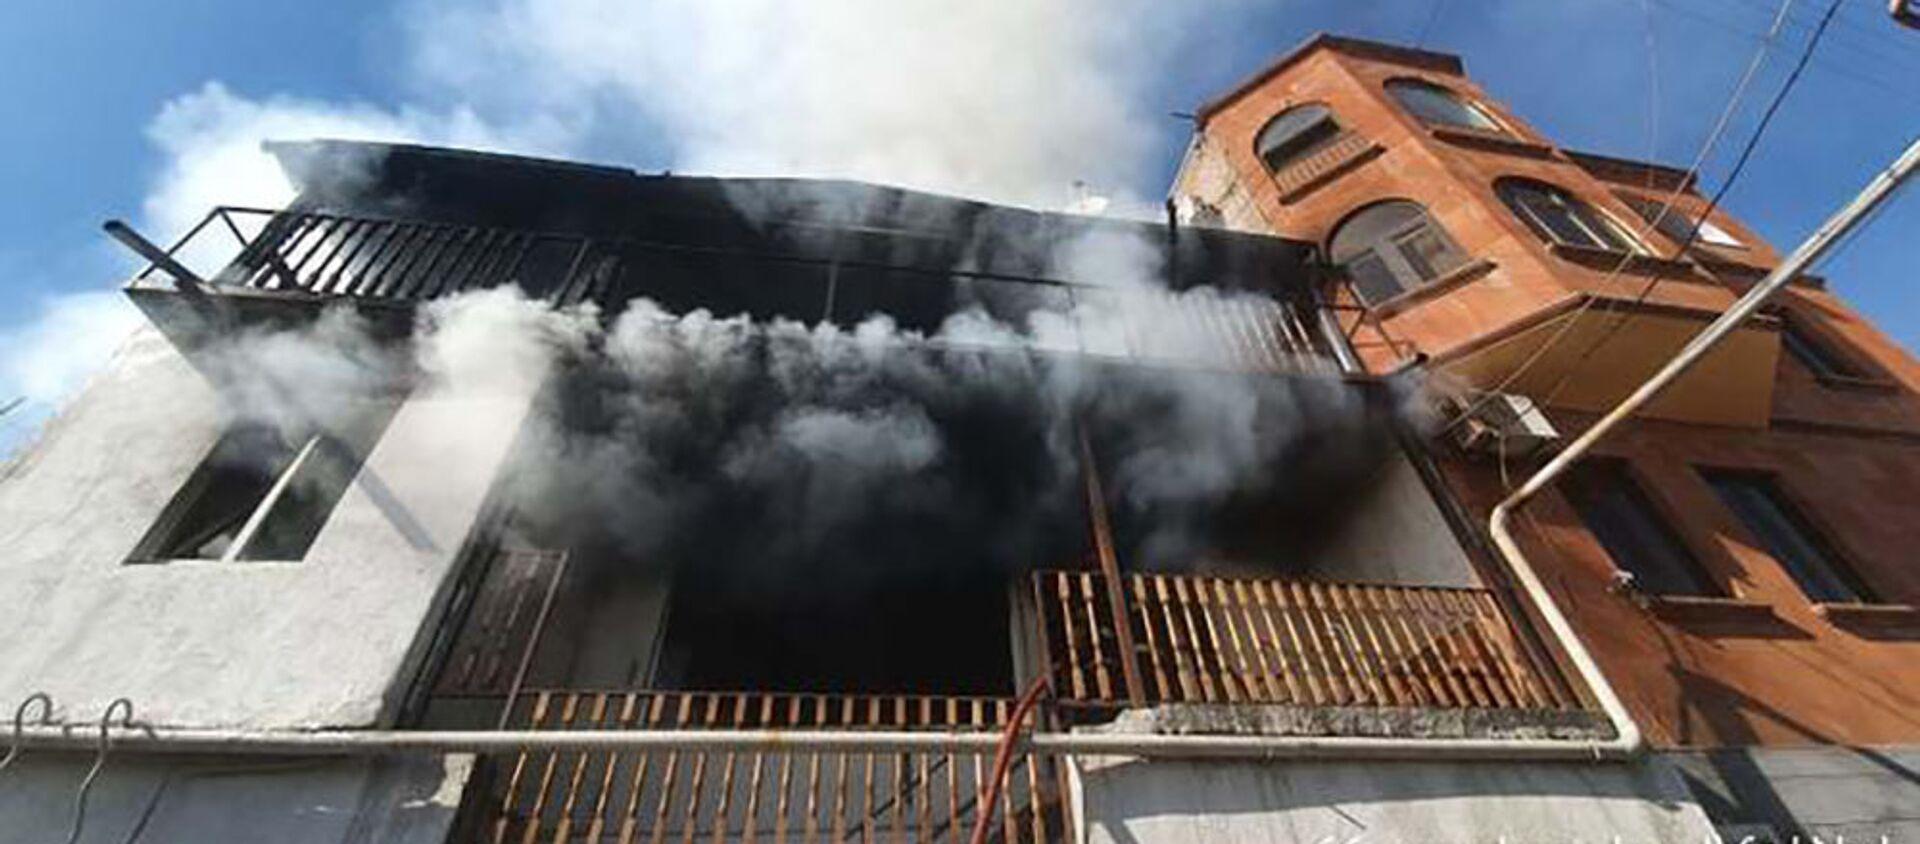 Пожар на улице Антараин - Sputnik Արմենիա, 1920, 03.06.2021